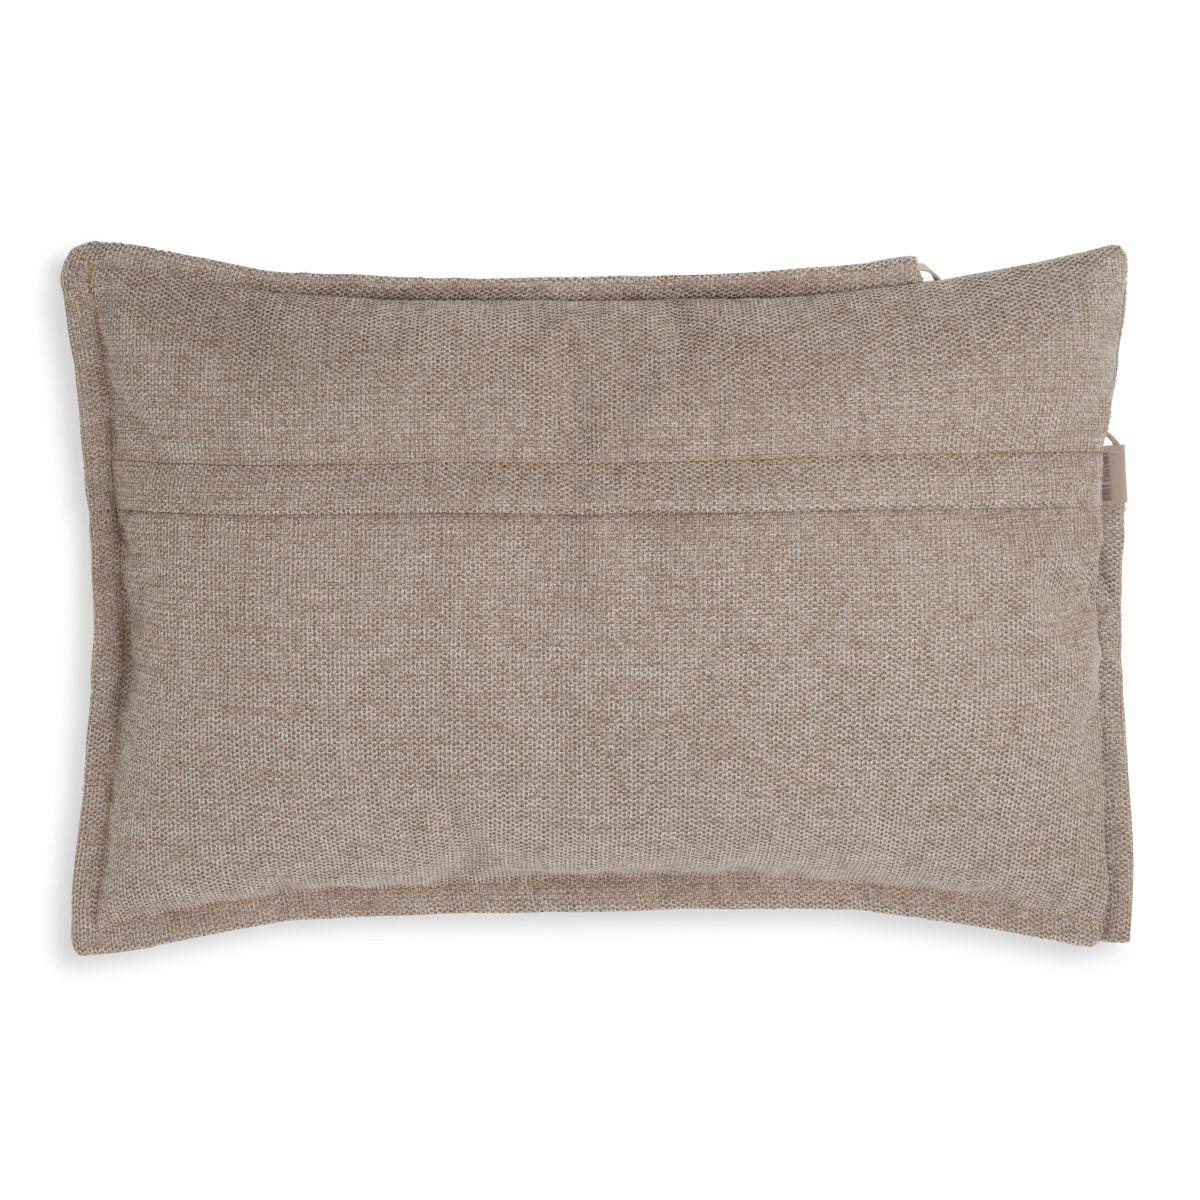 imre cushion beige 60x40